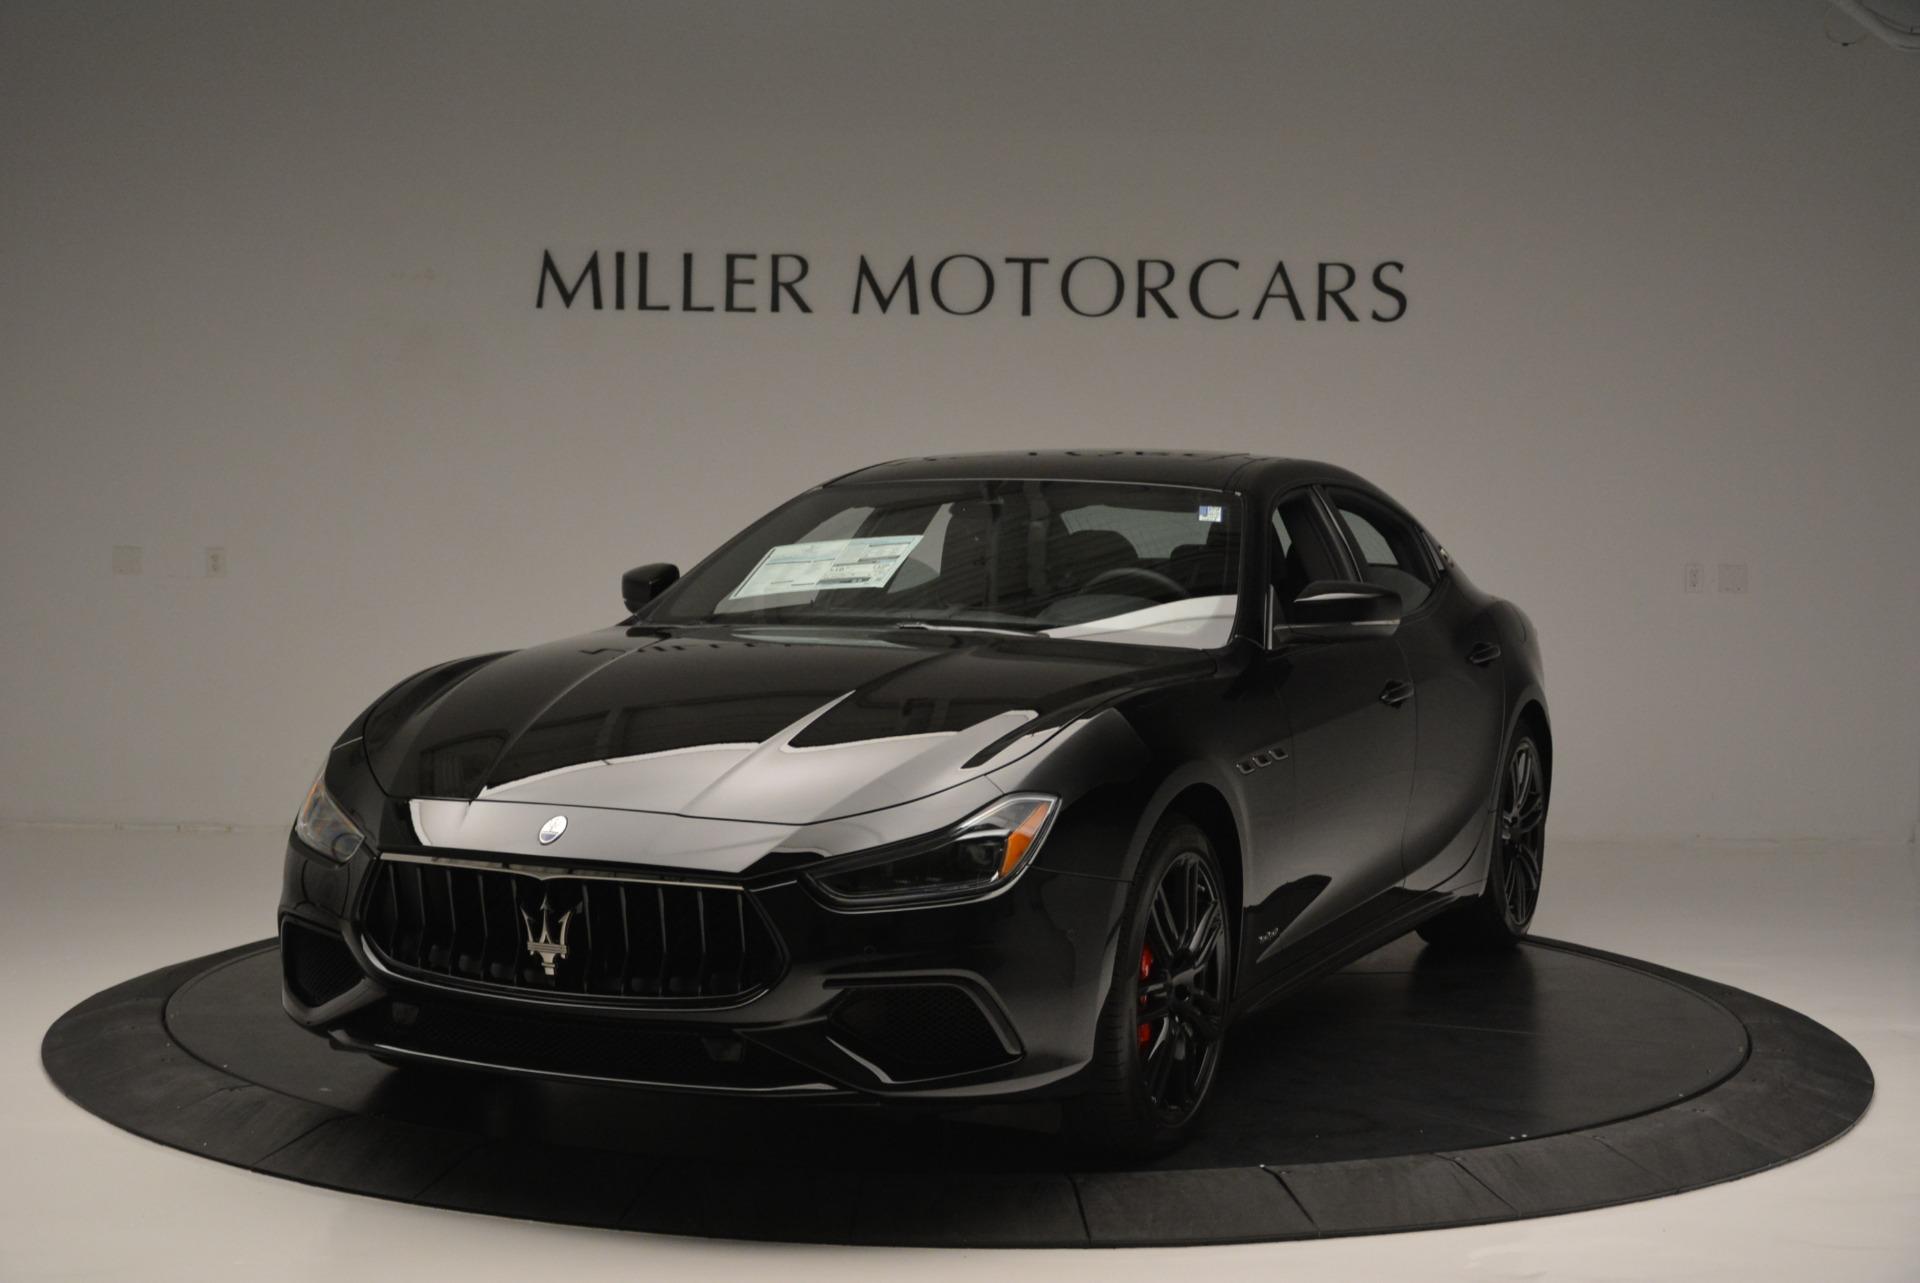 New 2018 Maserati Ghibli SQ4 GranSport Nerissimo For Sale In Westport, CT 2366_main